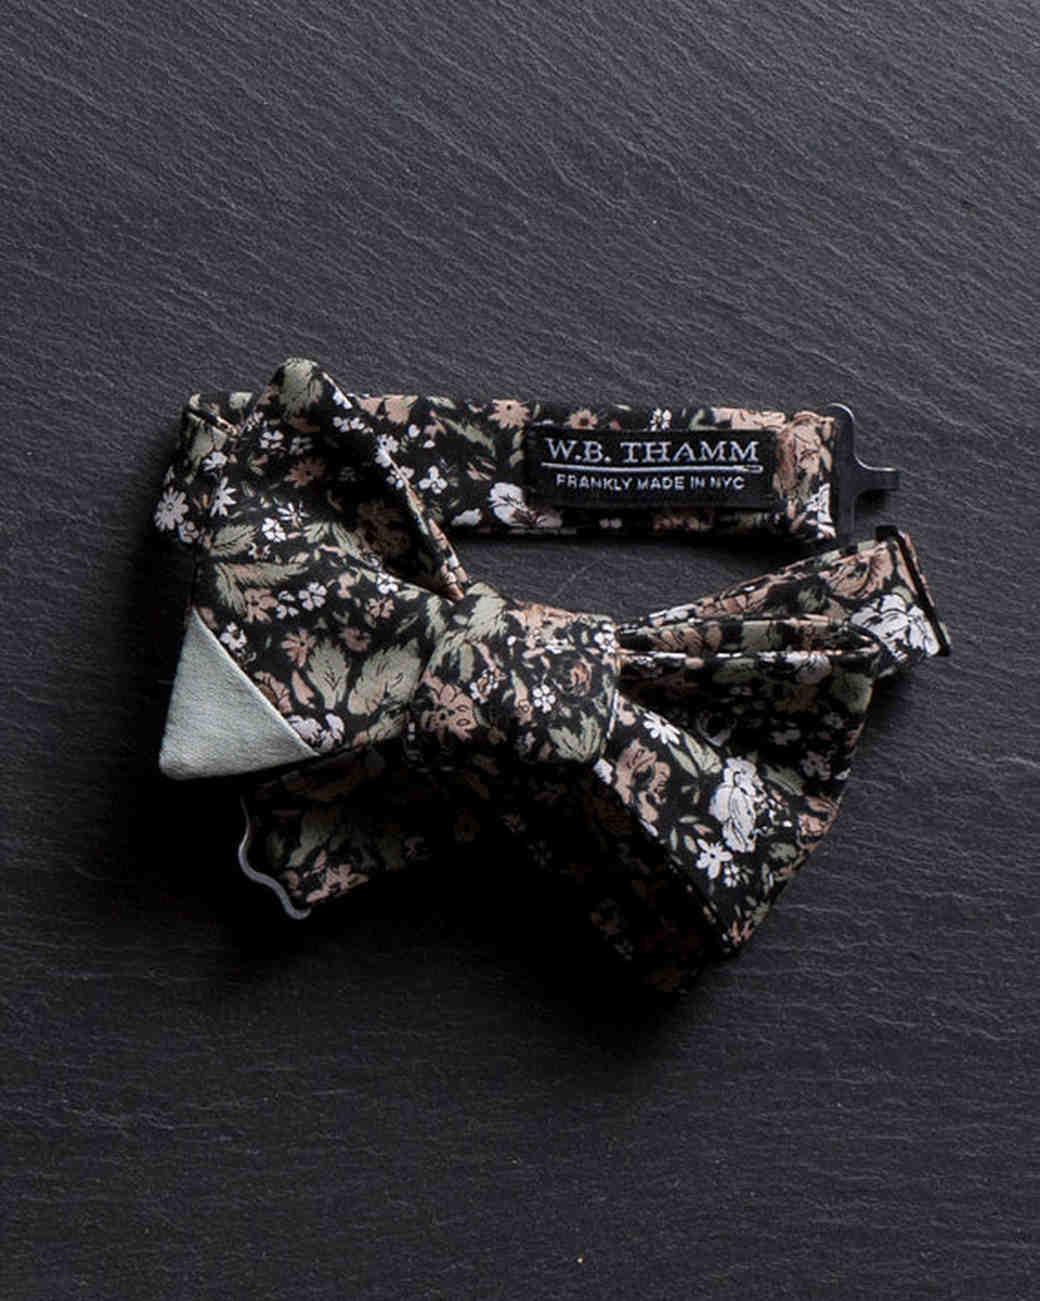 bow-ties-wbthamm-floral-black-0814.jpg